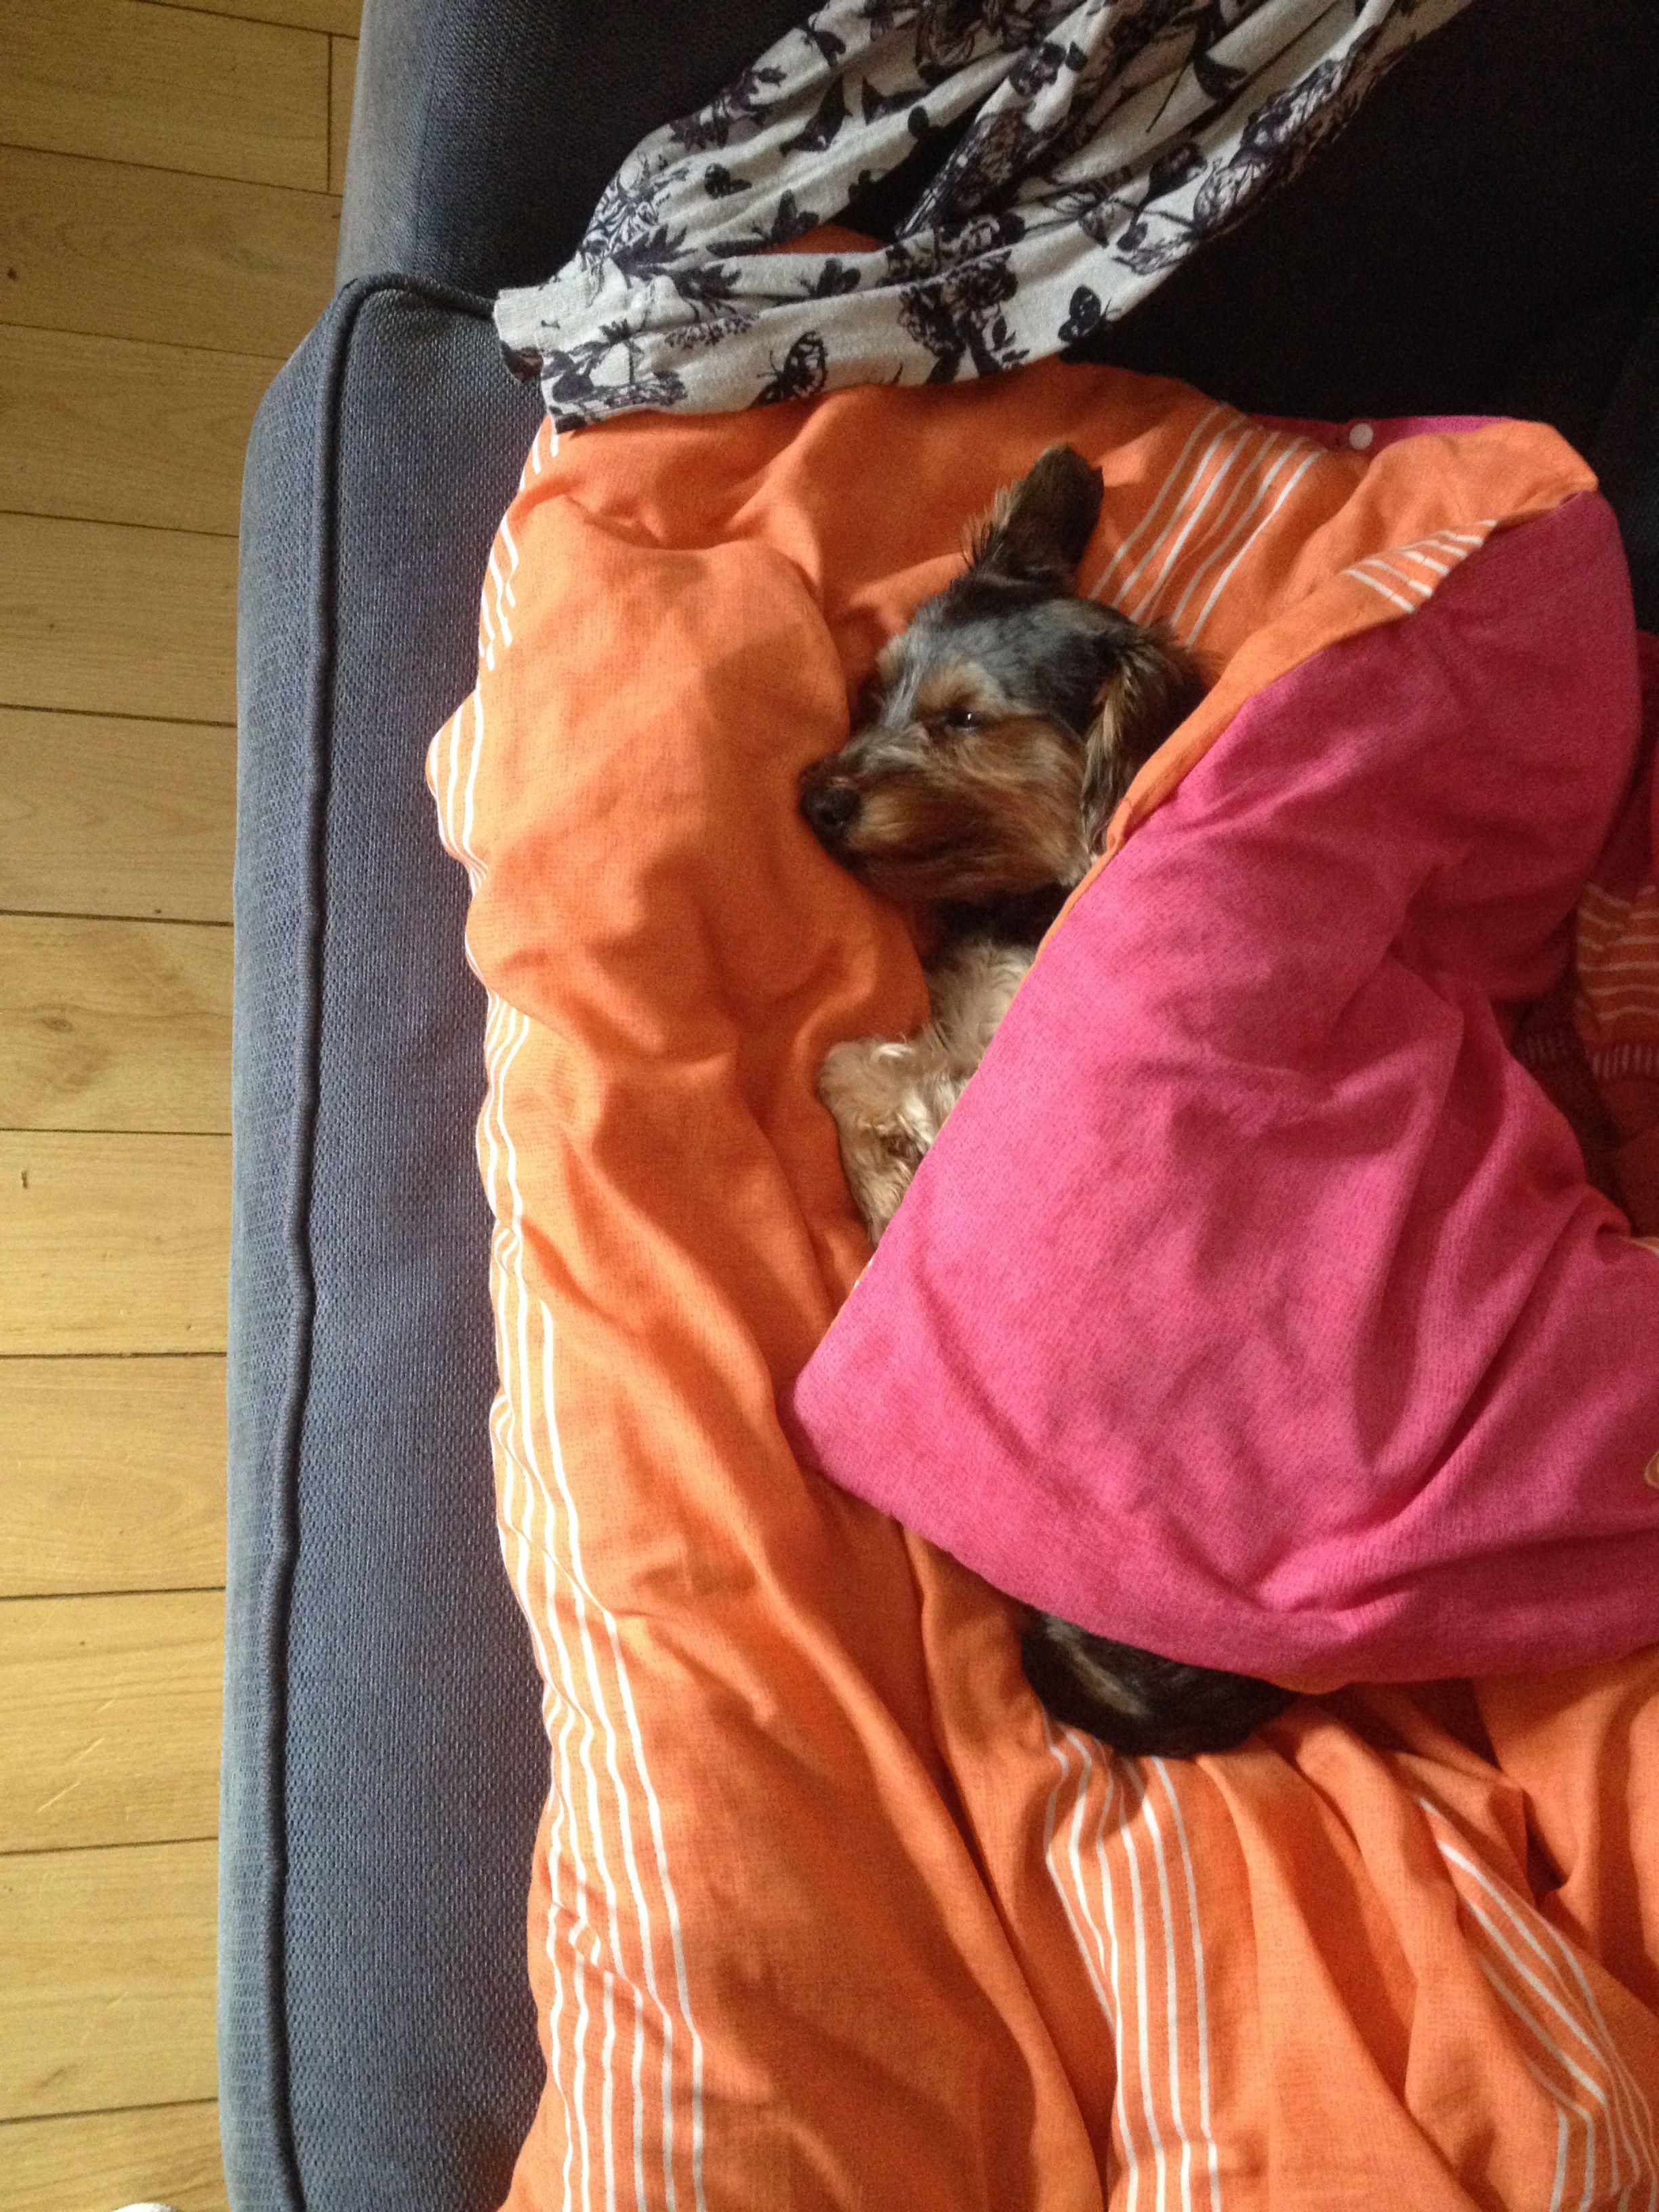 Mmmm, I'm enjoying my sleep in my own duvet...